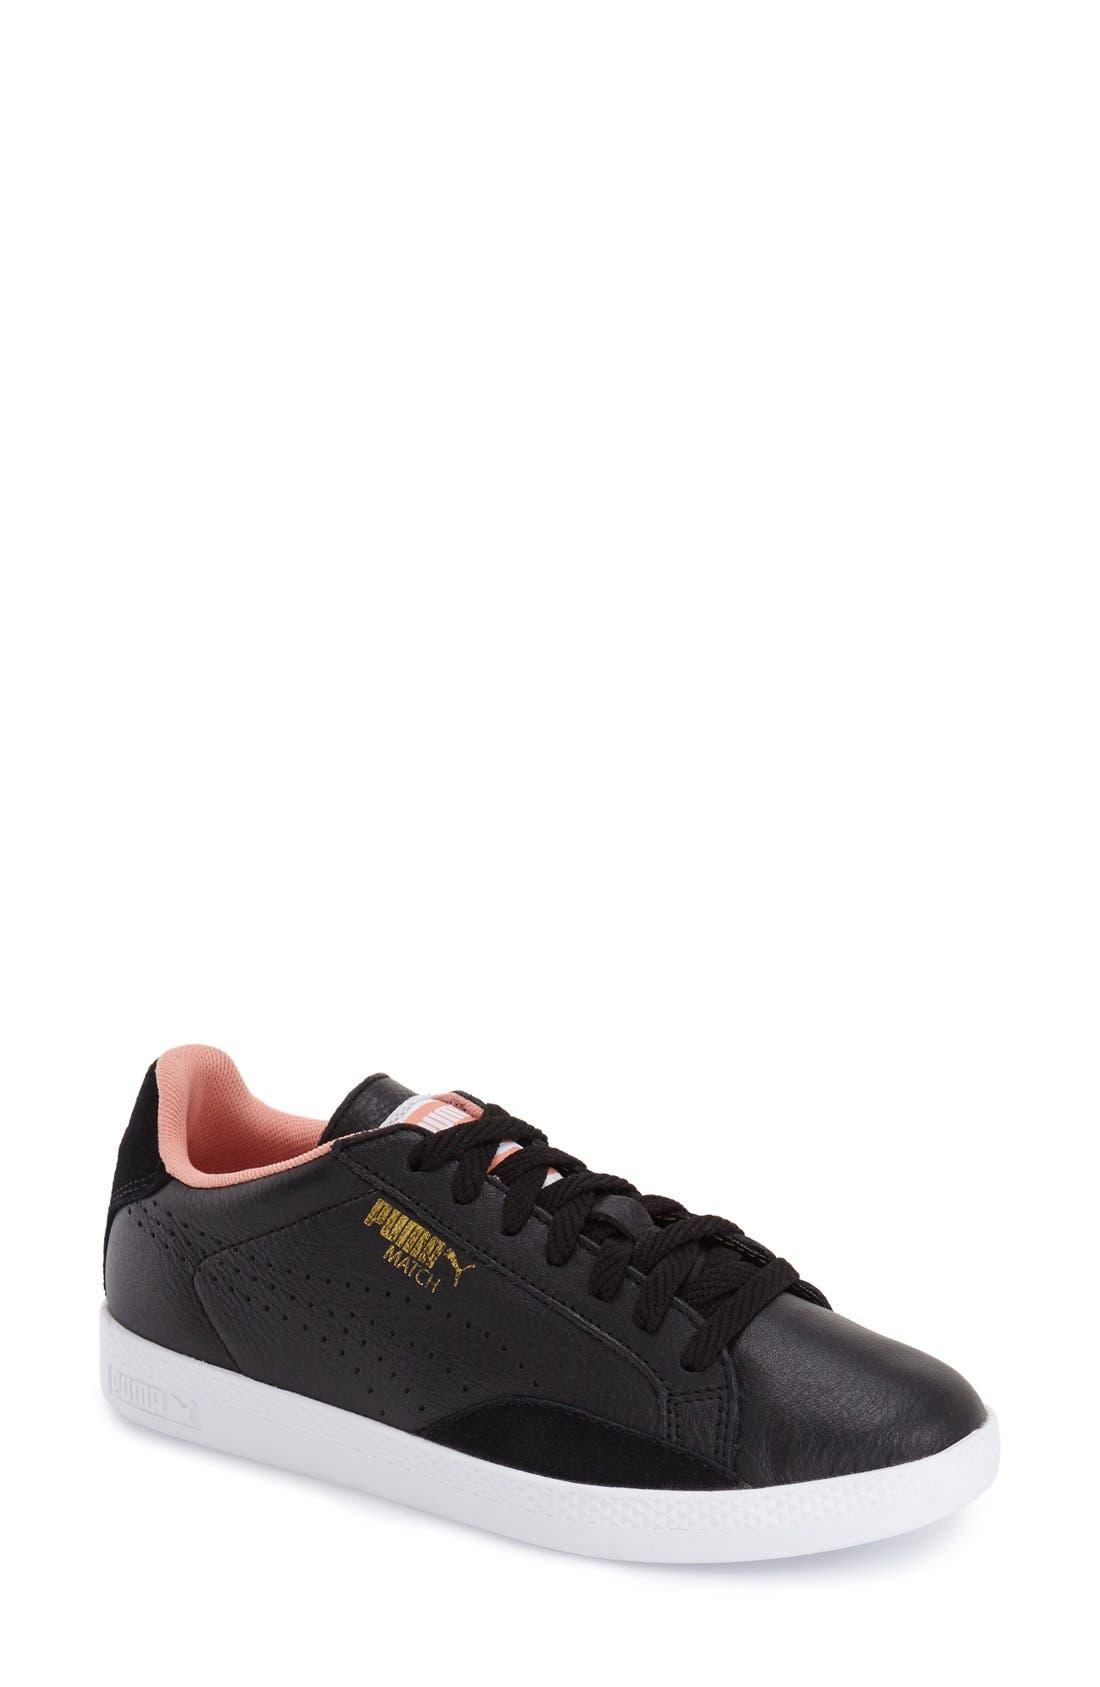 Main Image - PUMA 'Match Lo - Basic Sport' Leather Sneaker (Women)